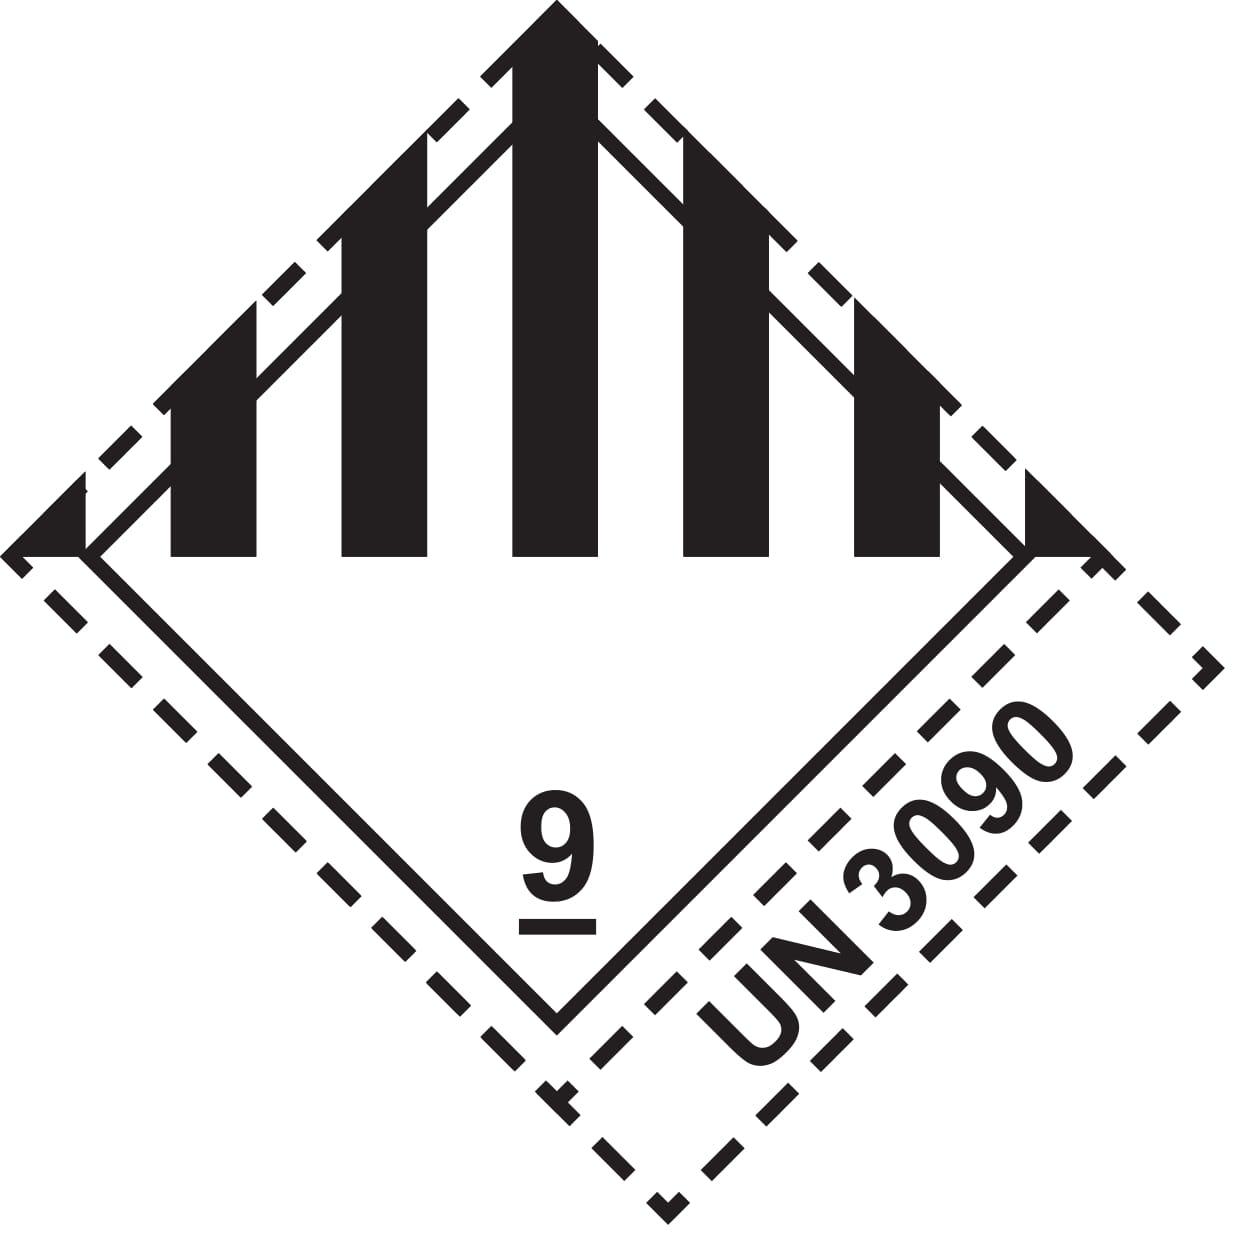 gefahrgut-label-kl9-3090-1